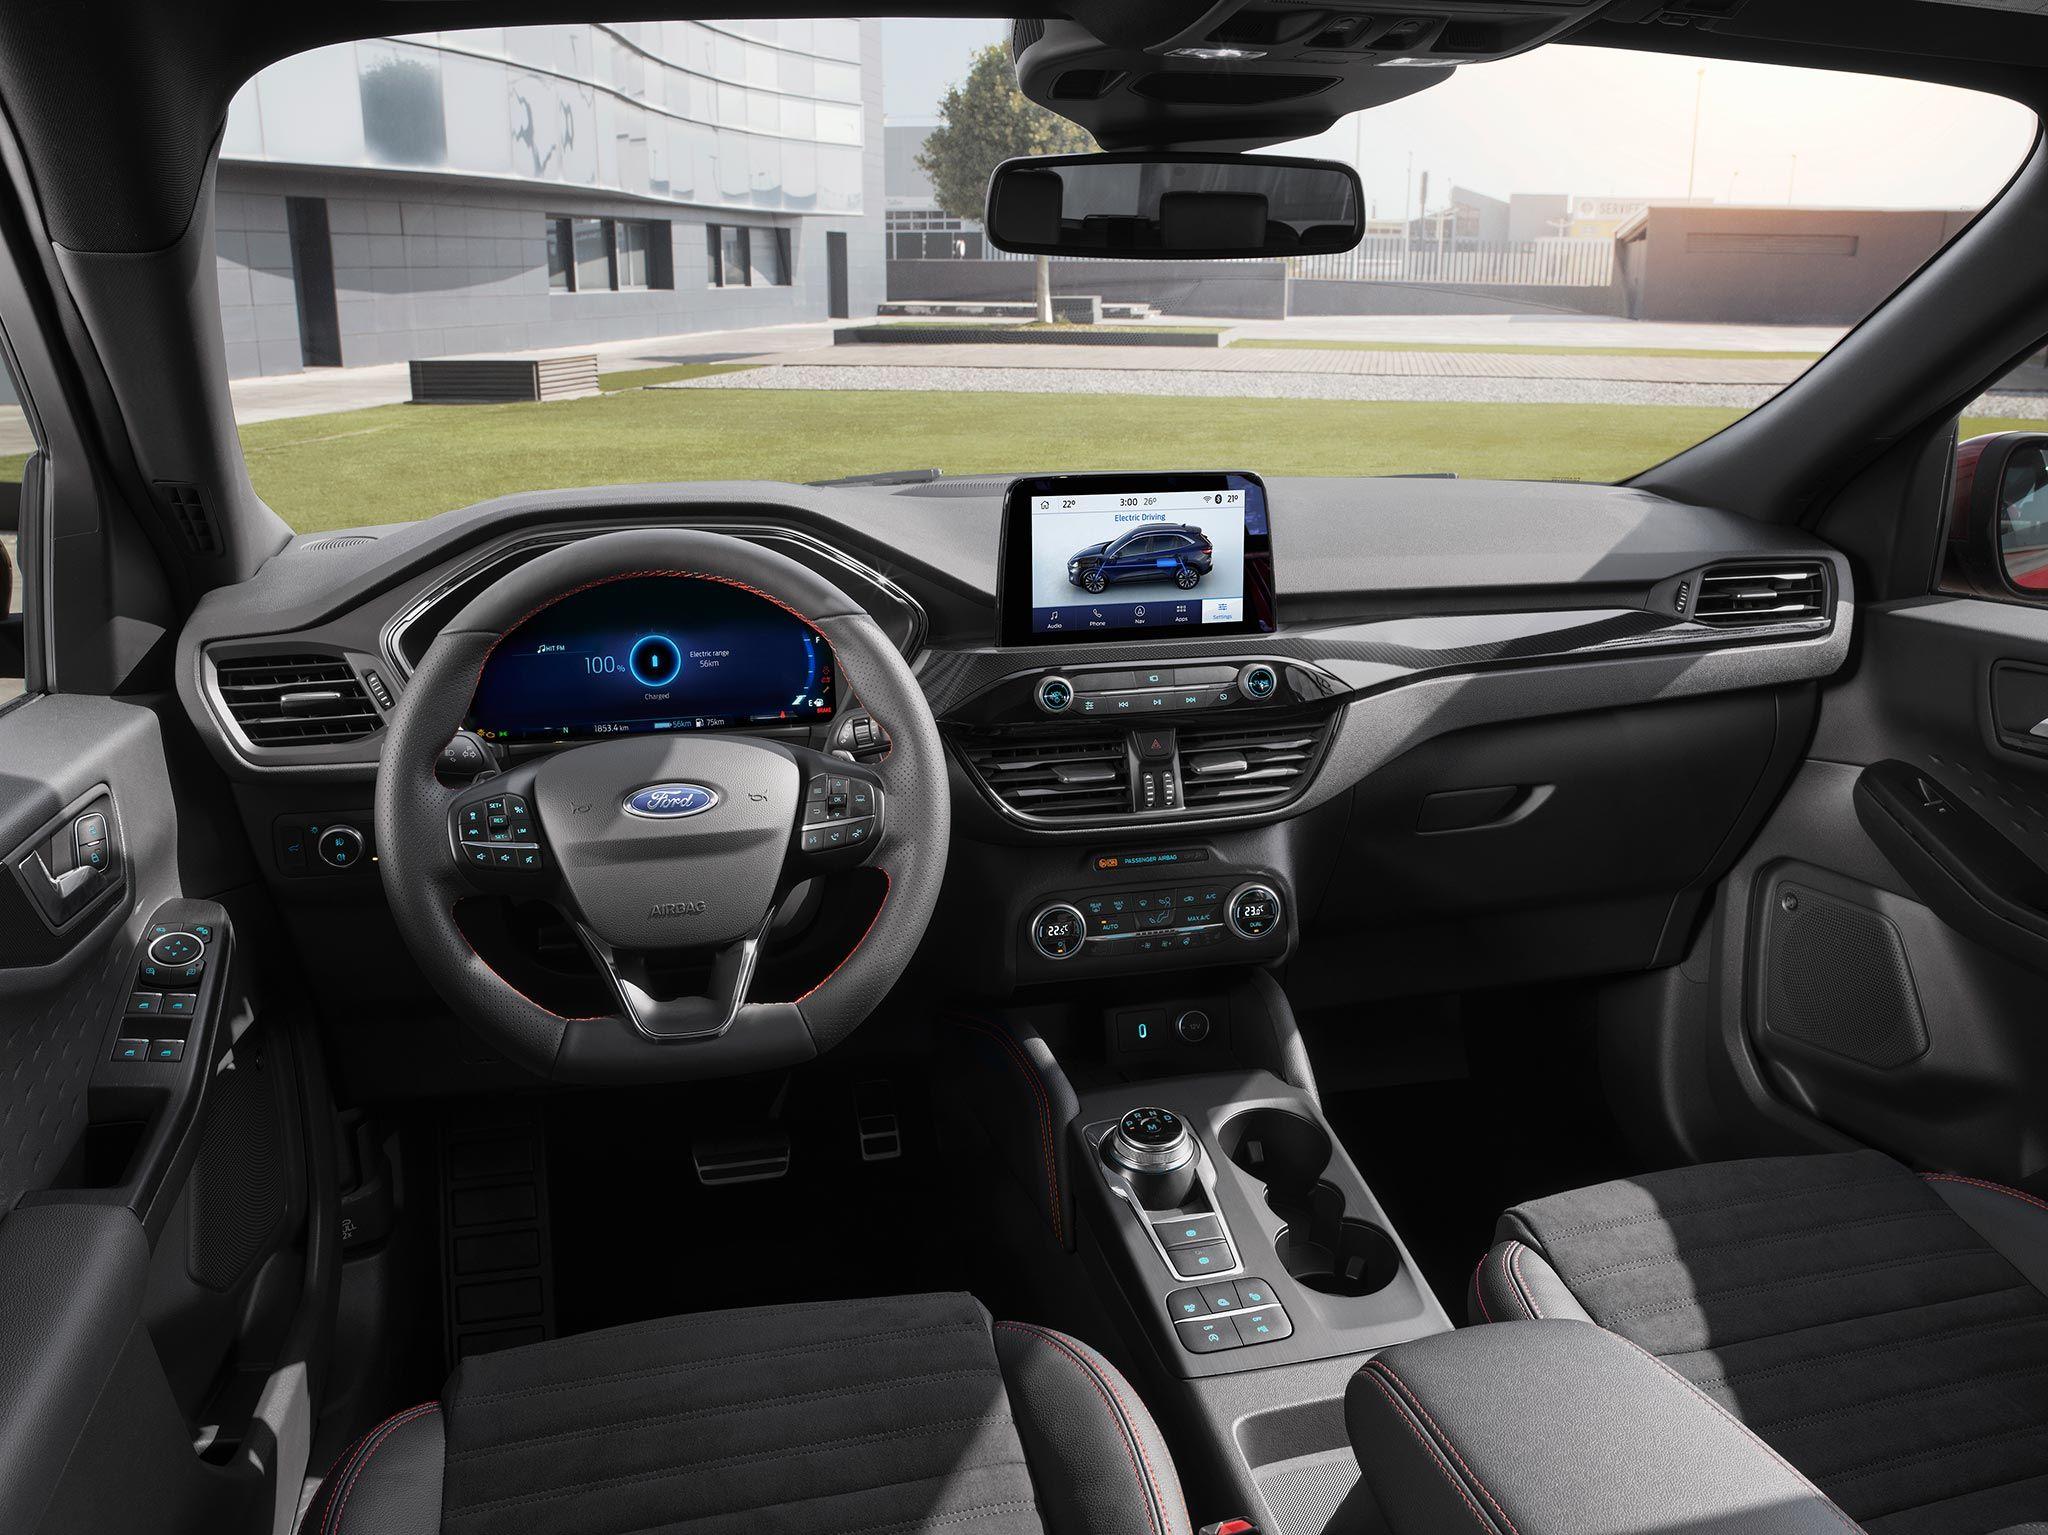 Ford Kuga 2020 Ford Motor Porsche Macan